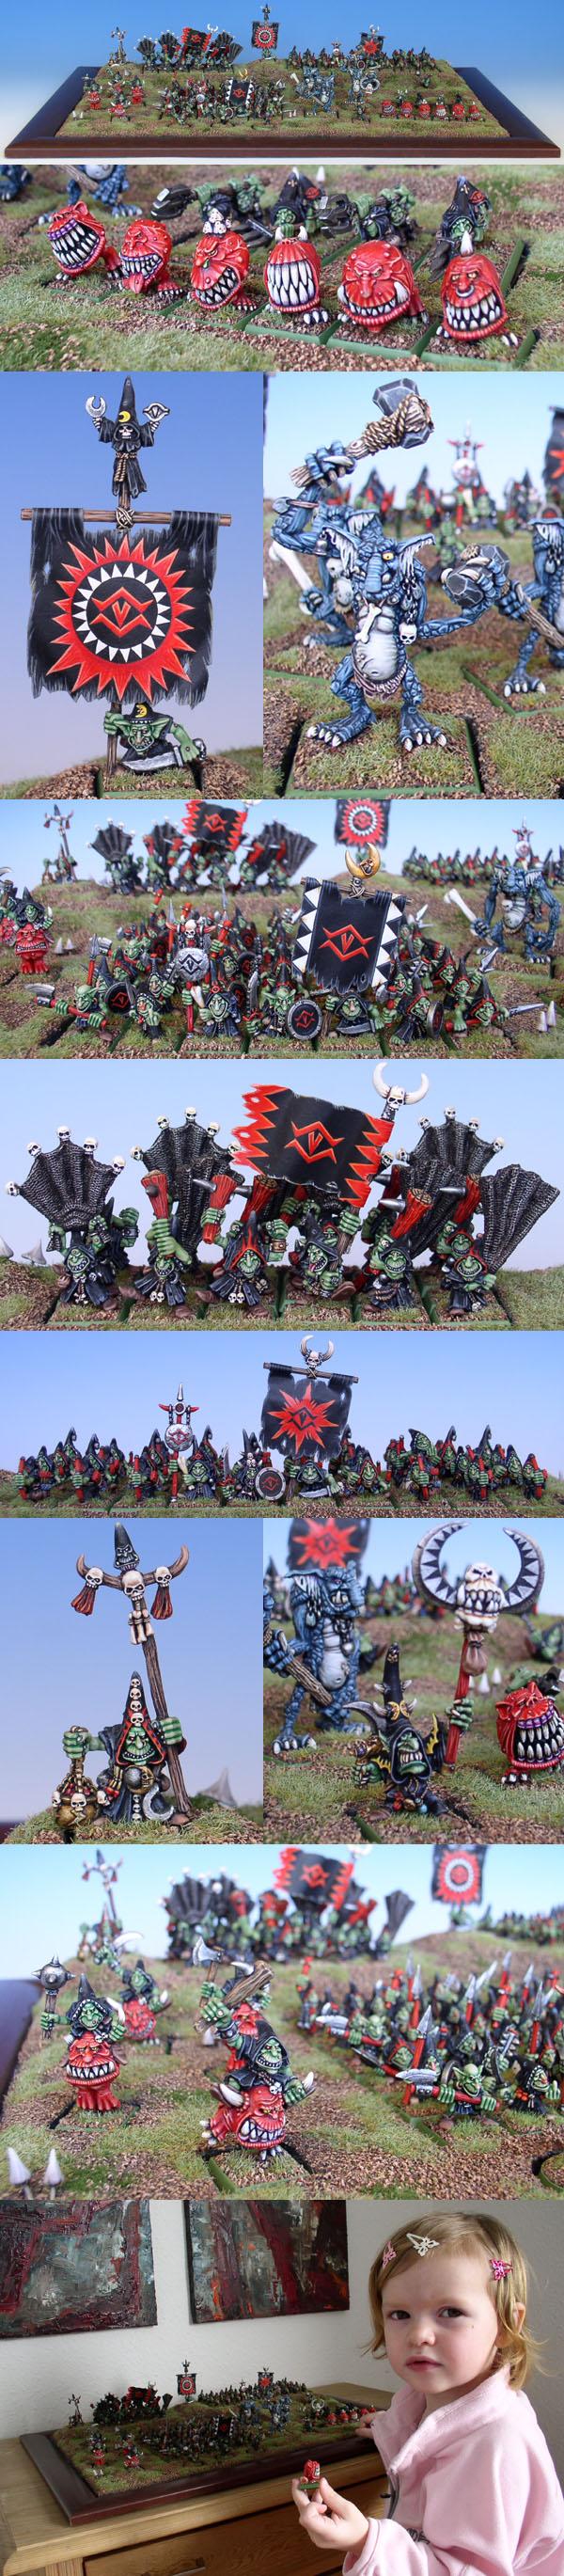 Night Goblin Army